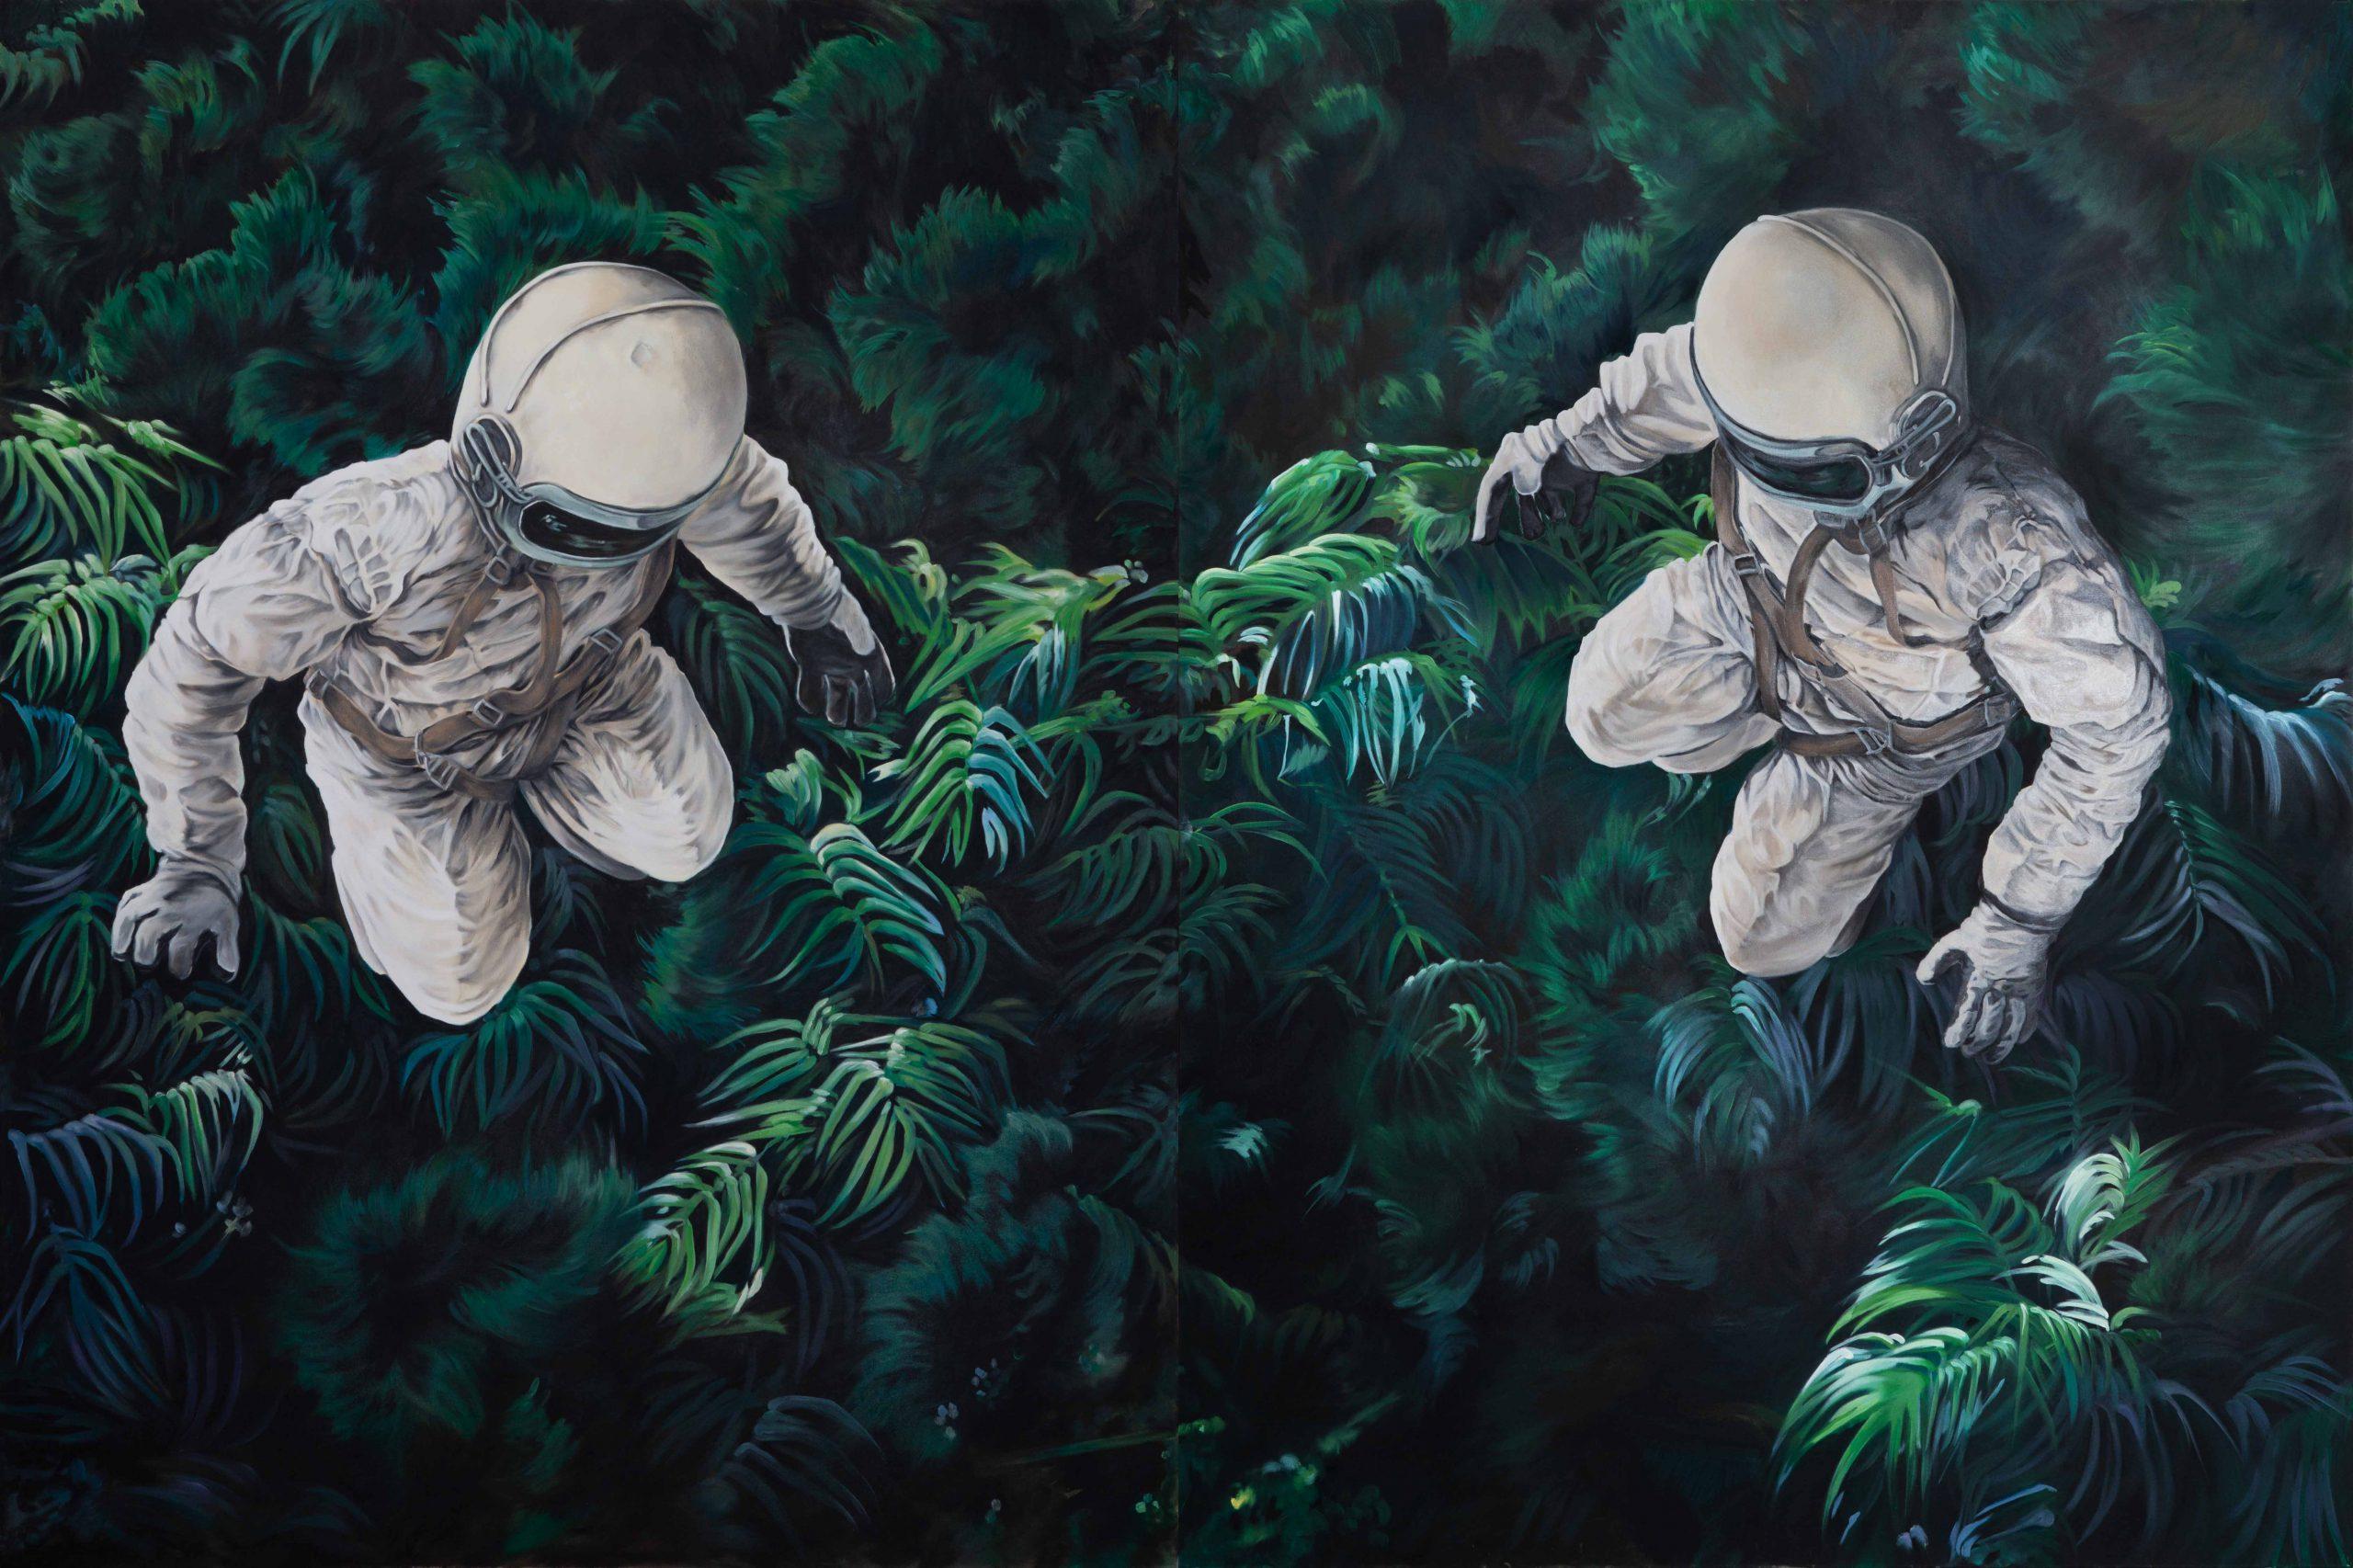 zwei Astronauten schweben